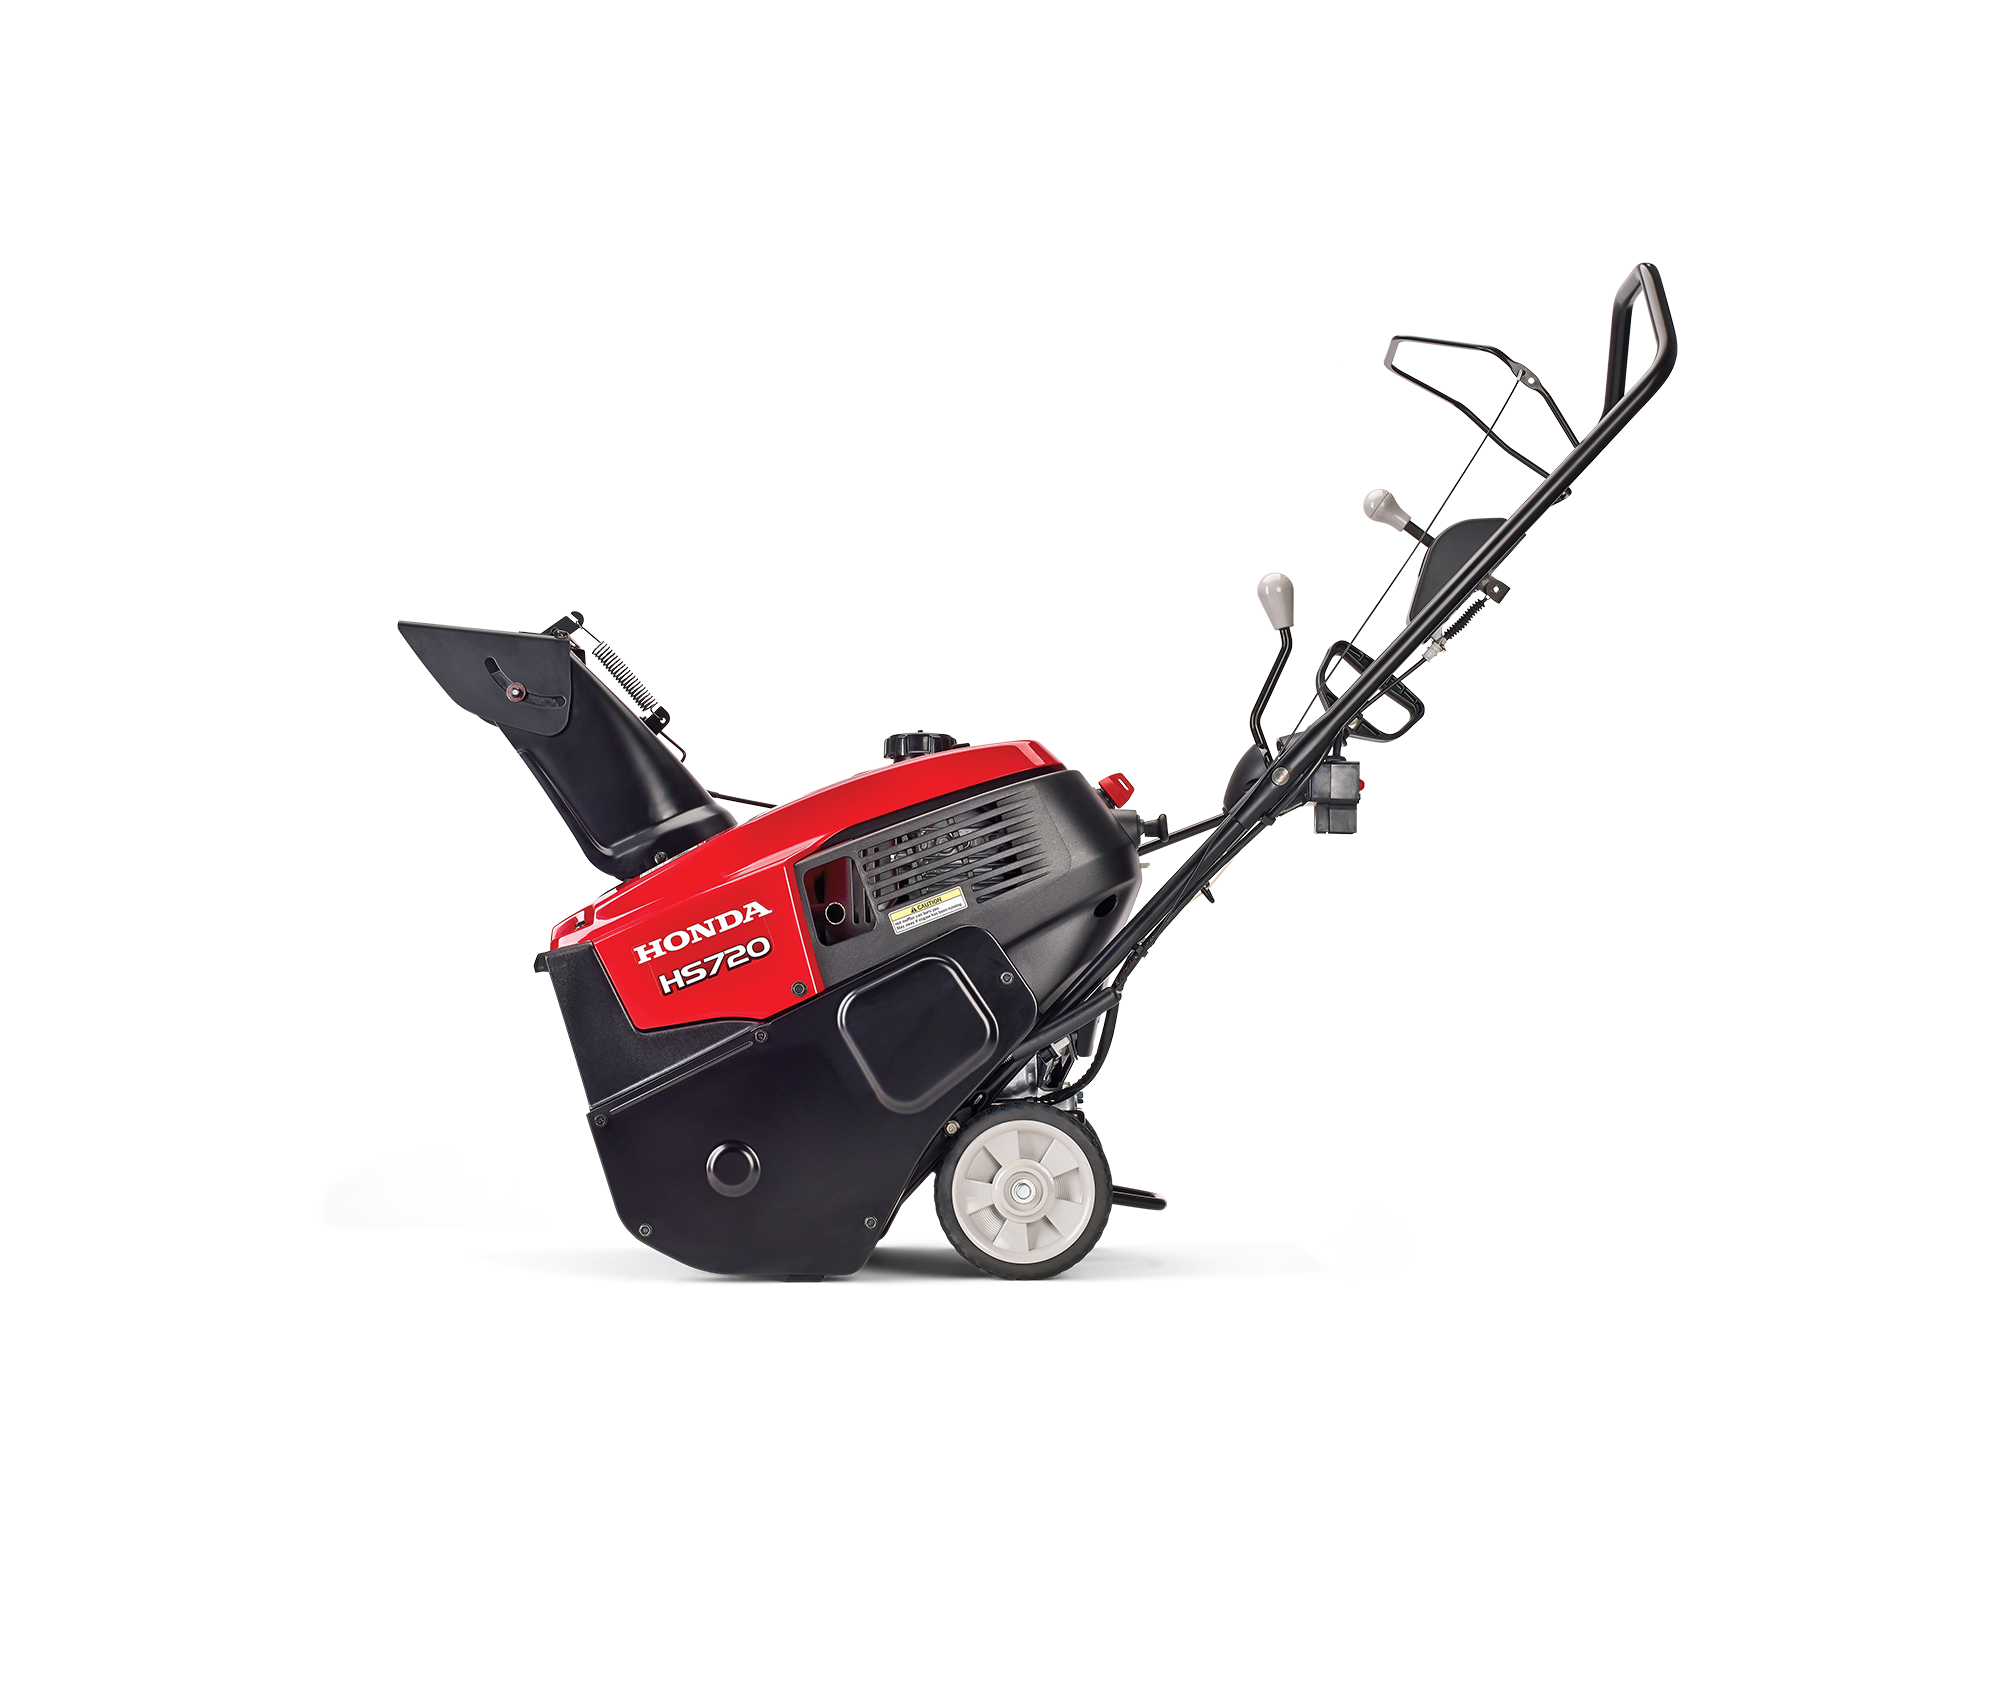 craftsman 5.5 hp lawn mower manual